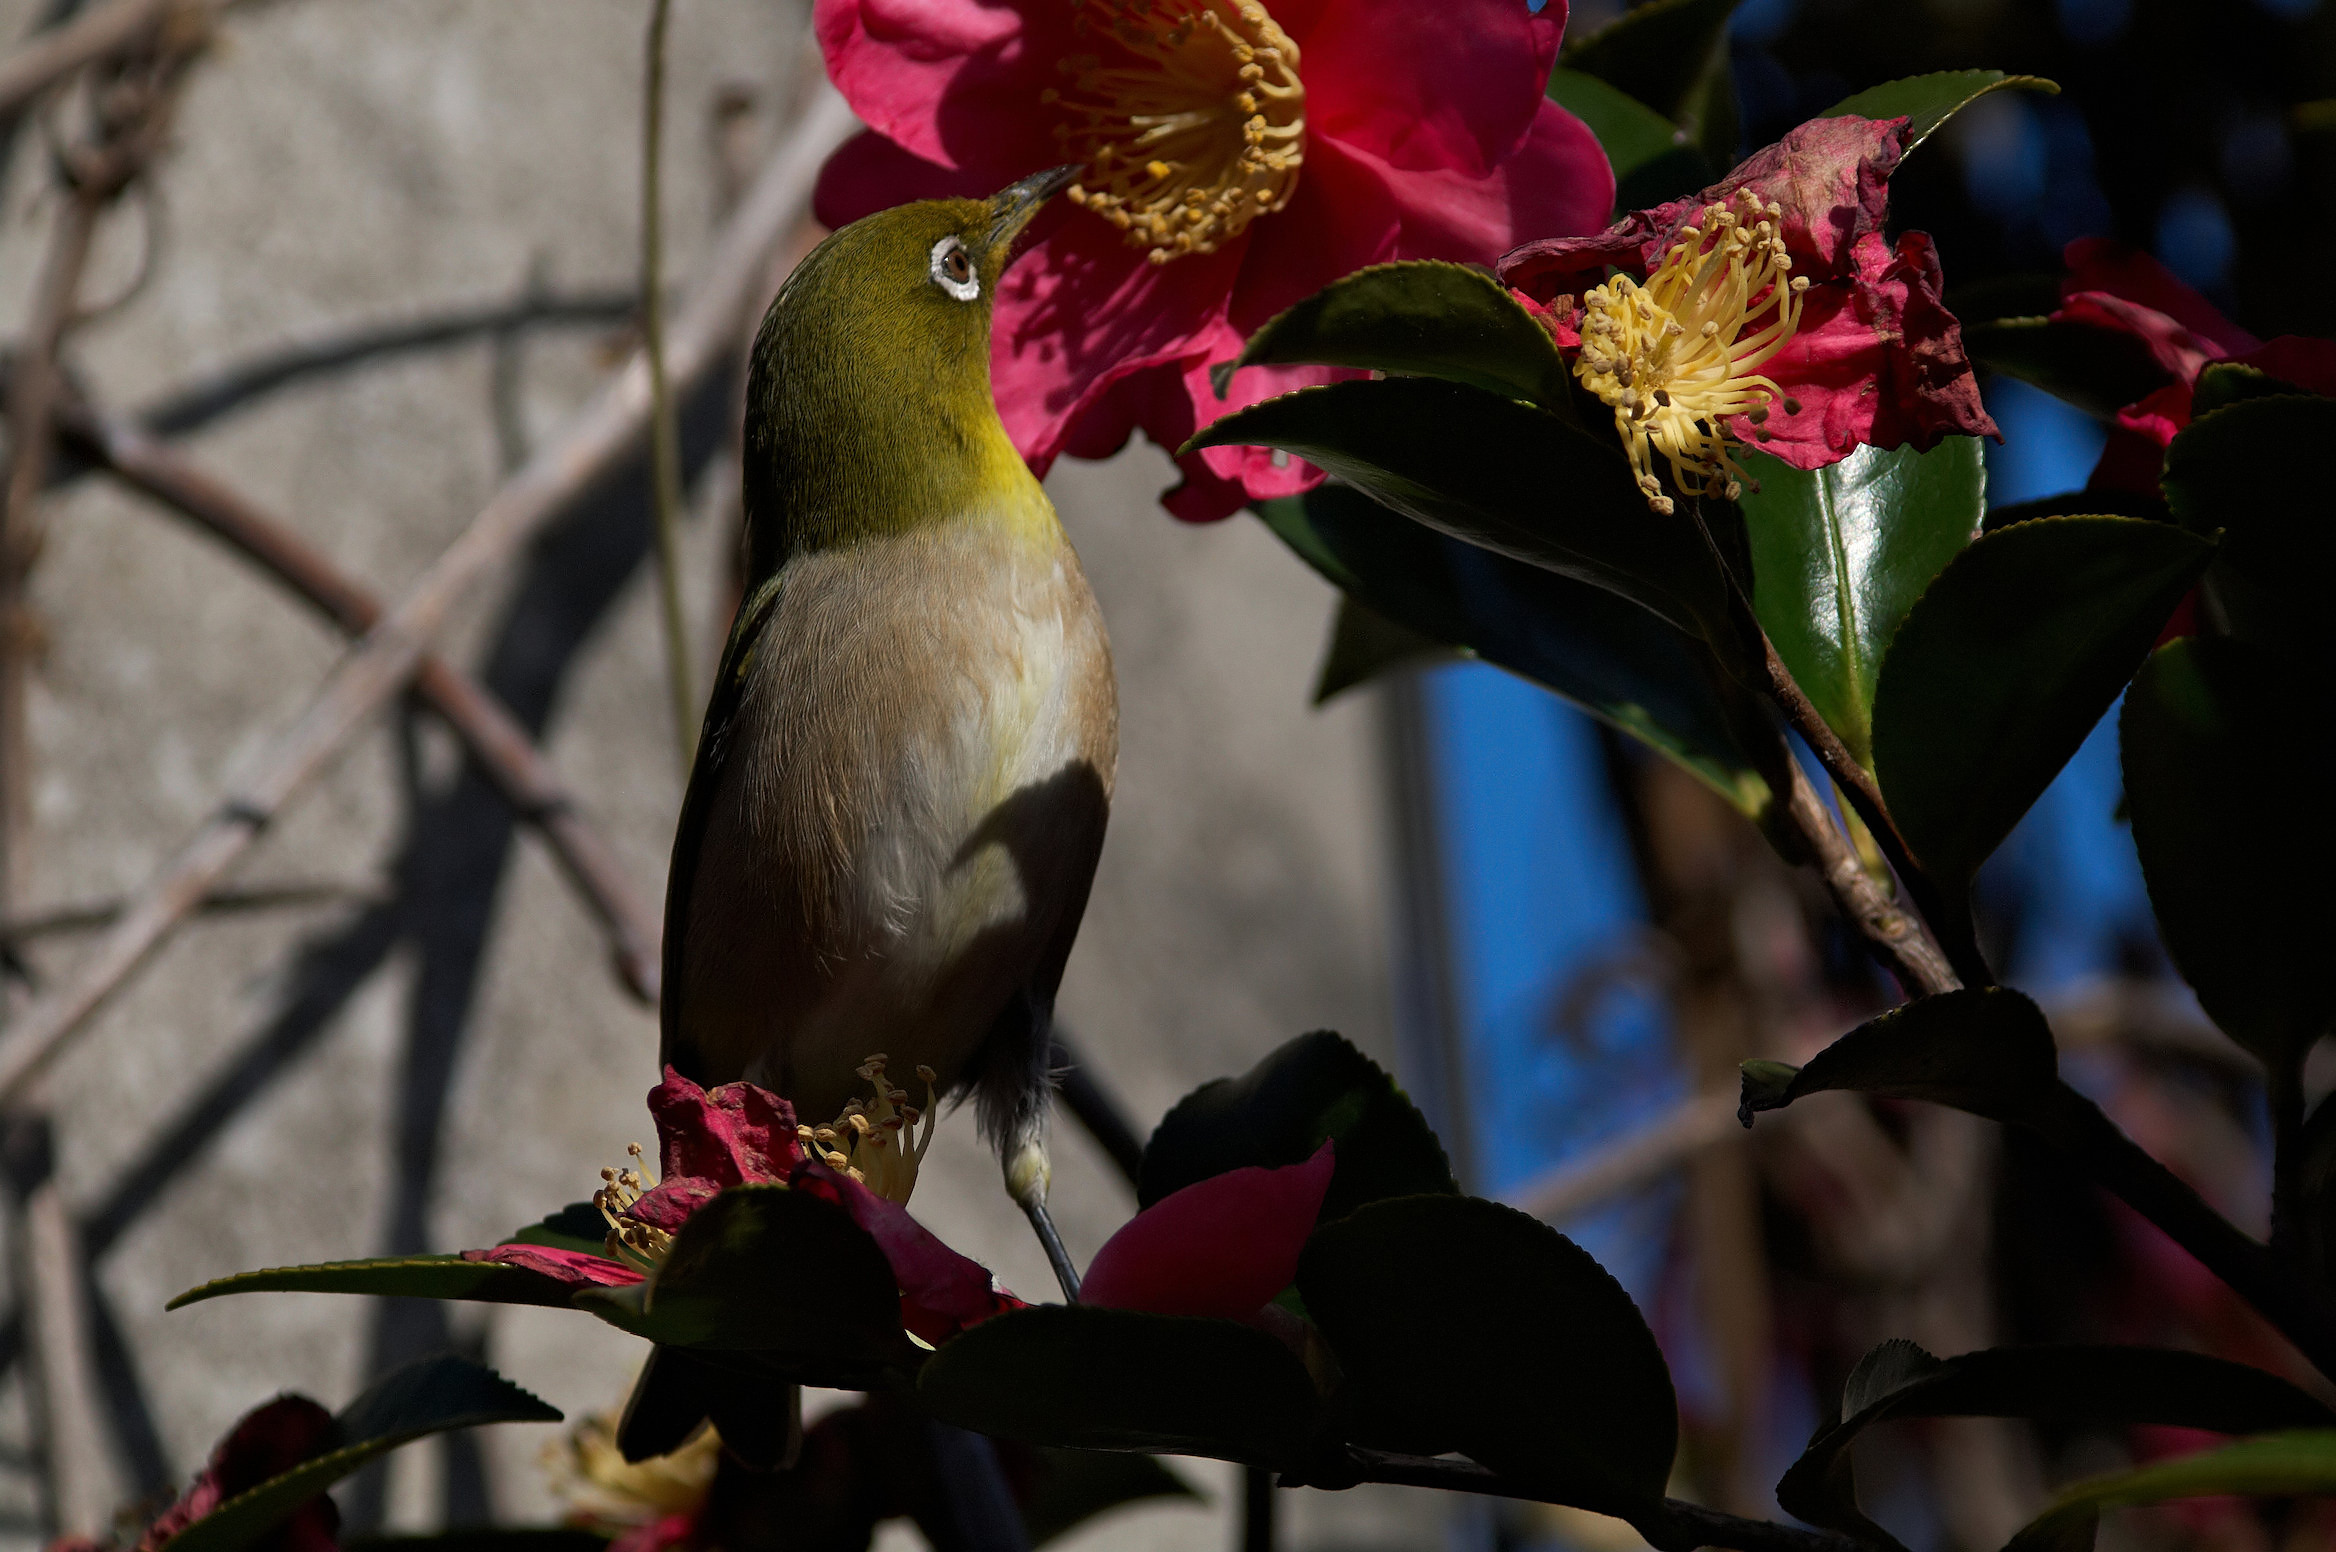 AFボーグ BORG77EDⅡで撮影した野鳥・メジロの写真画像